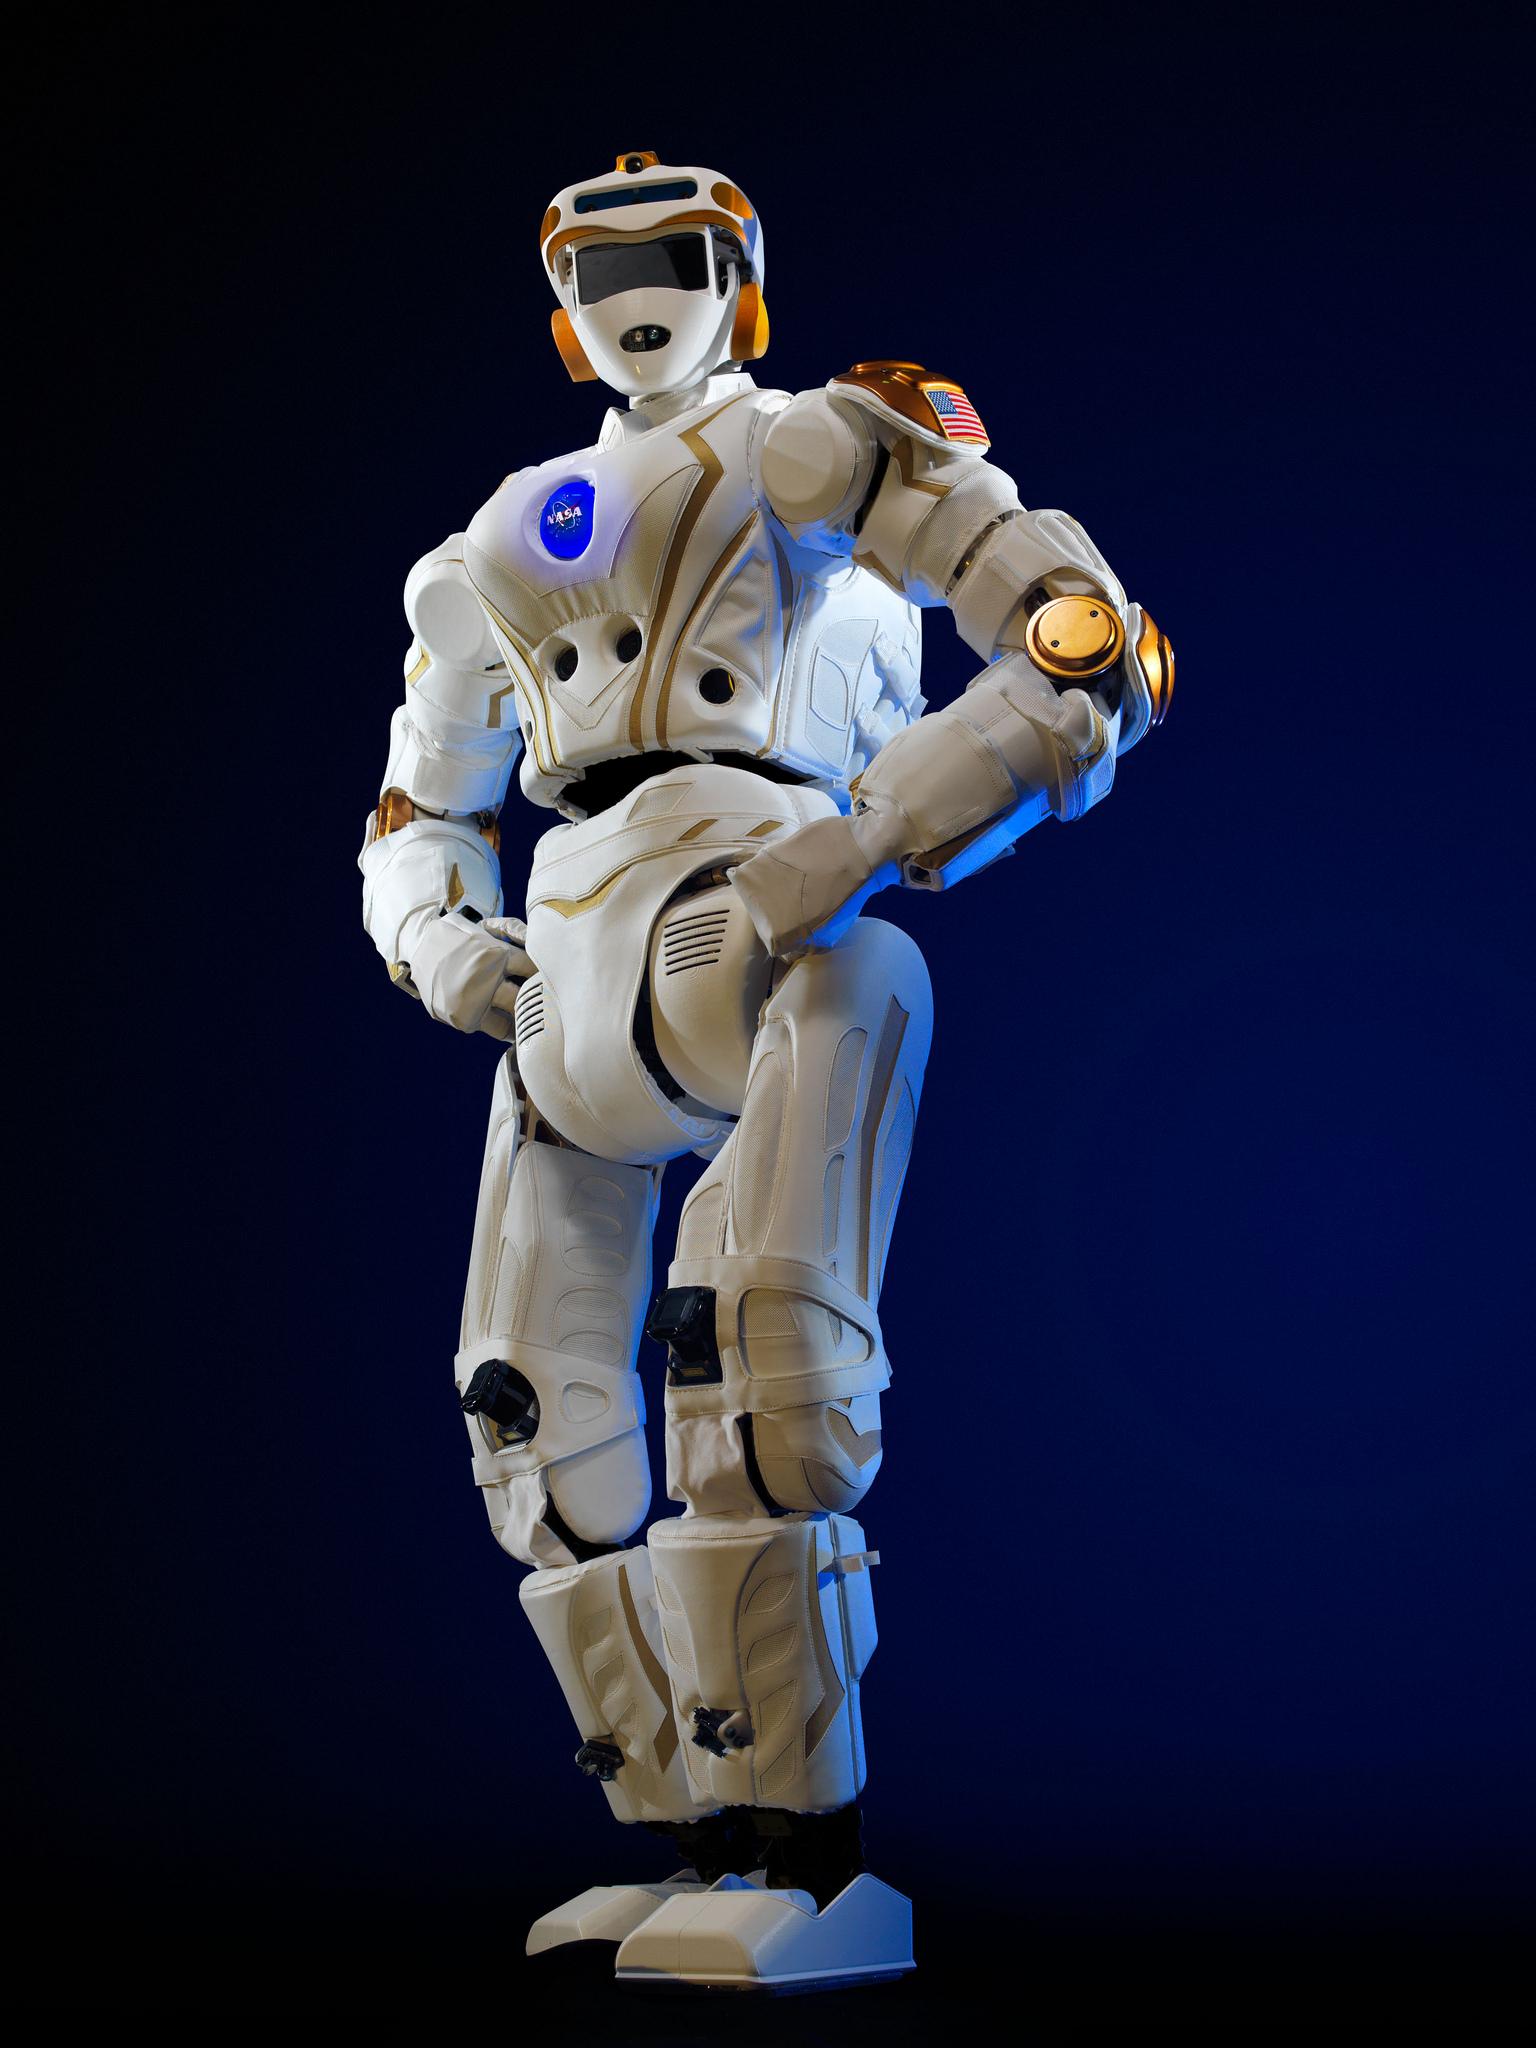 NASA's R5 robot entry into the DARPARobotics Challenge Photo: NASA